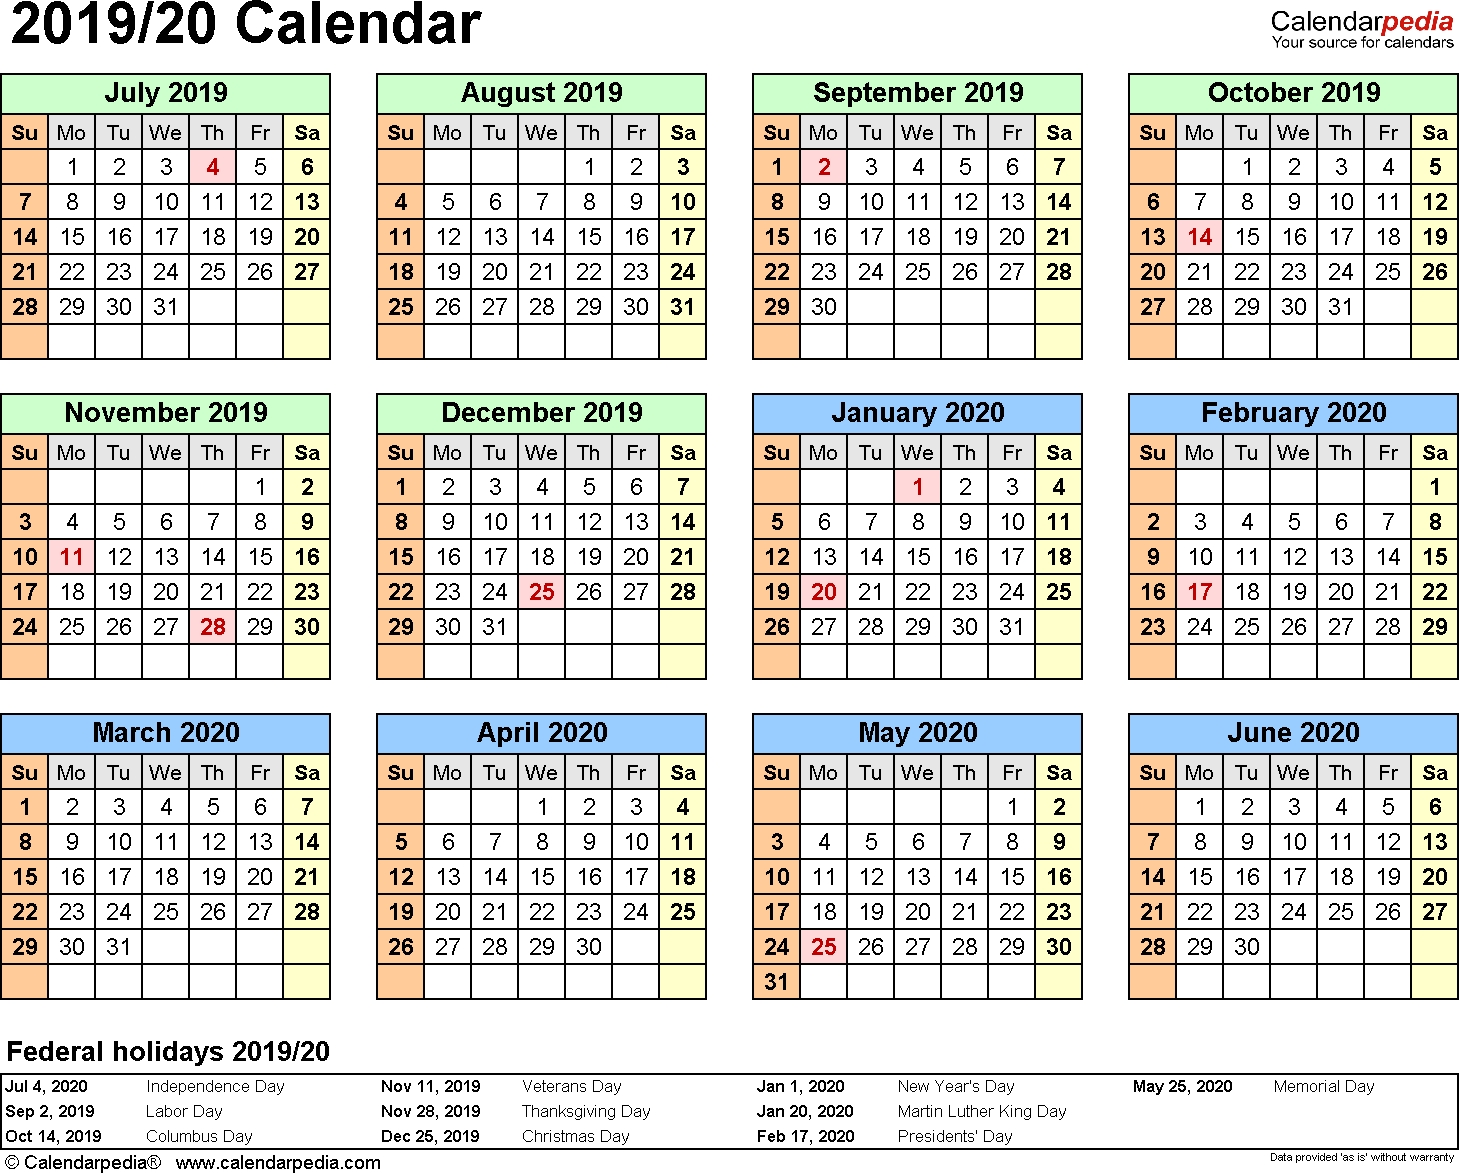 Split Year Calendar 2019/20 (July To June) - Pdf Templates  2020 To 2020 Financial Year Calendar